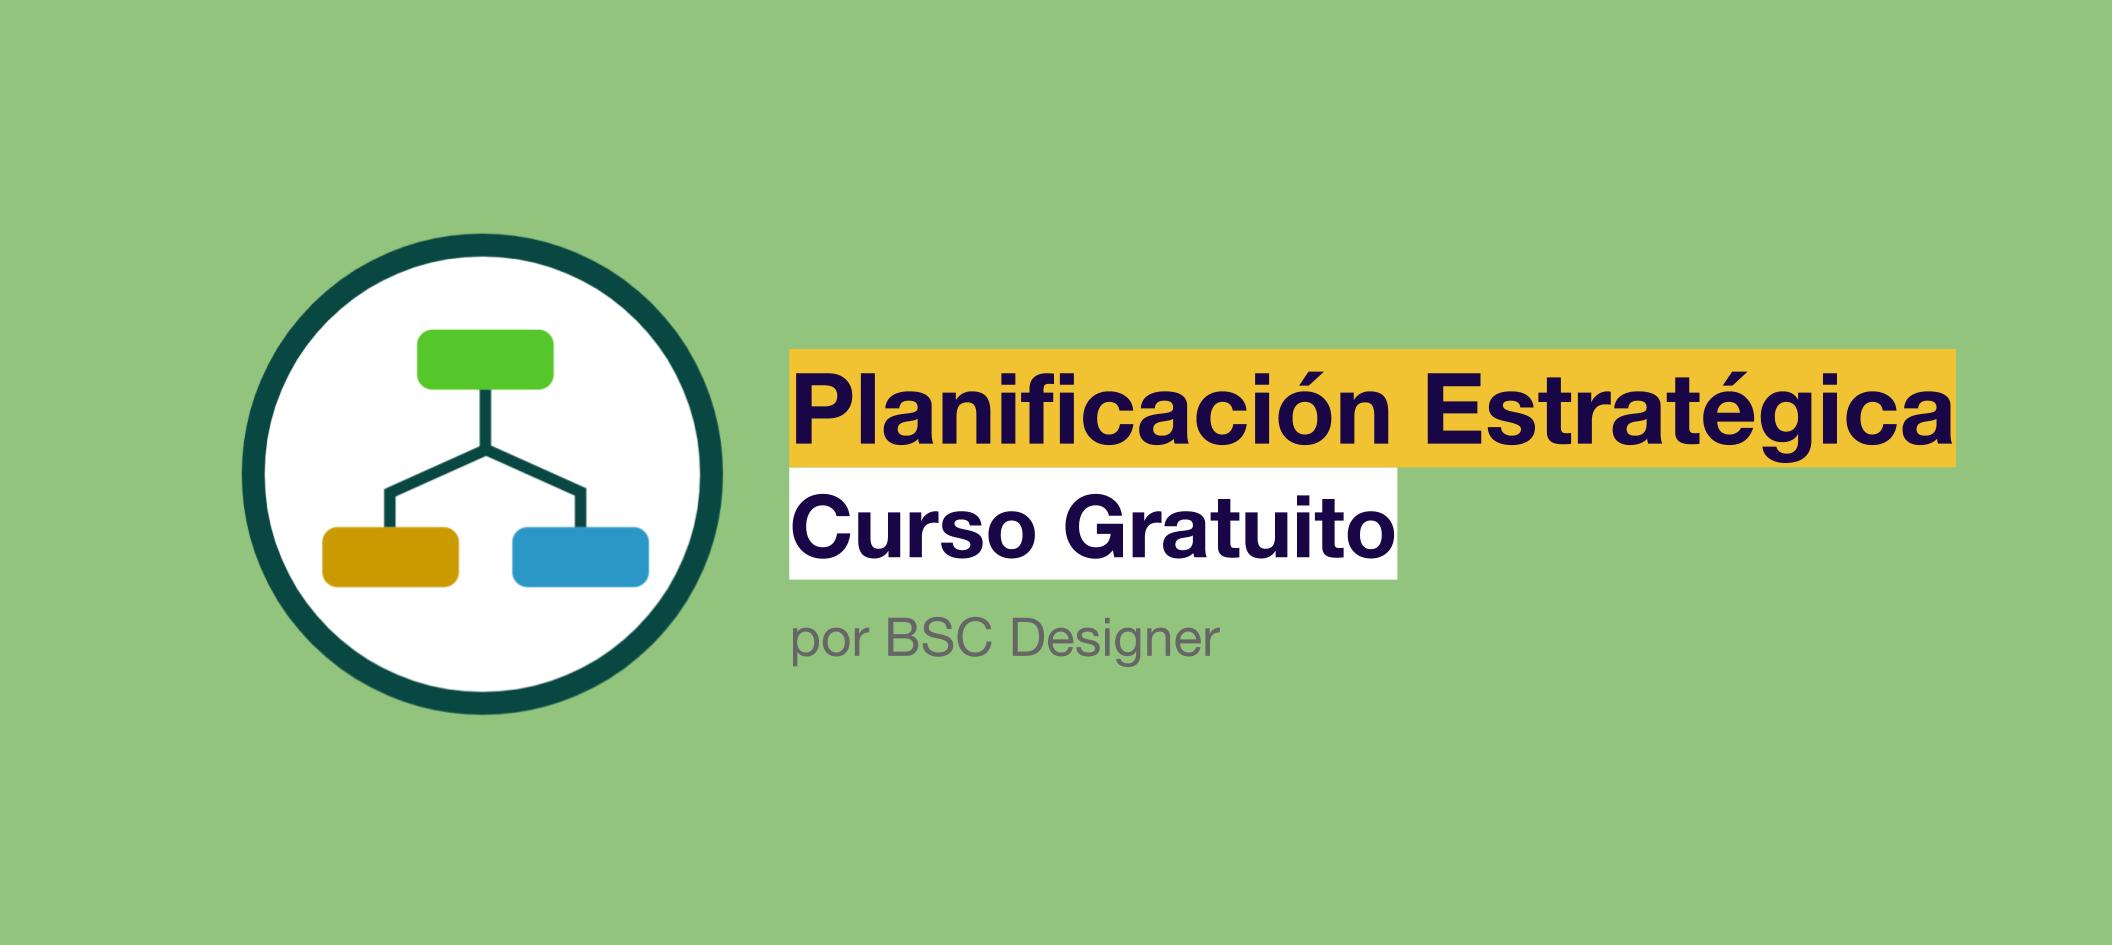 Planificacion estratégica curso gratuito